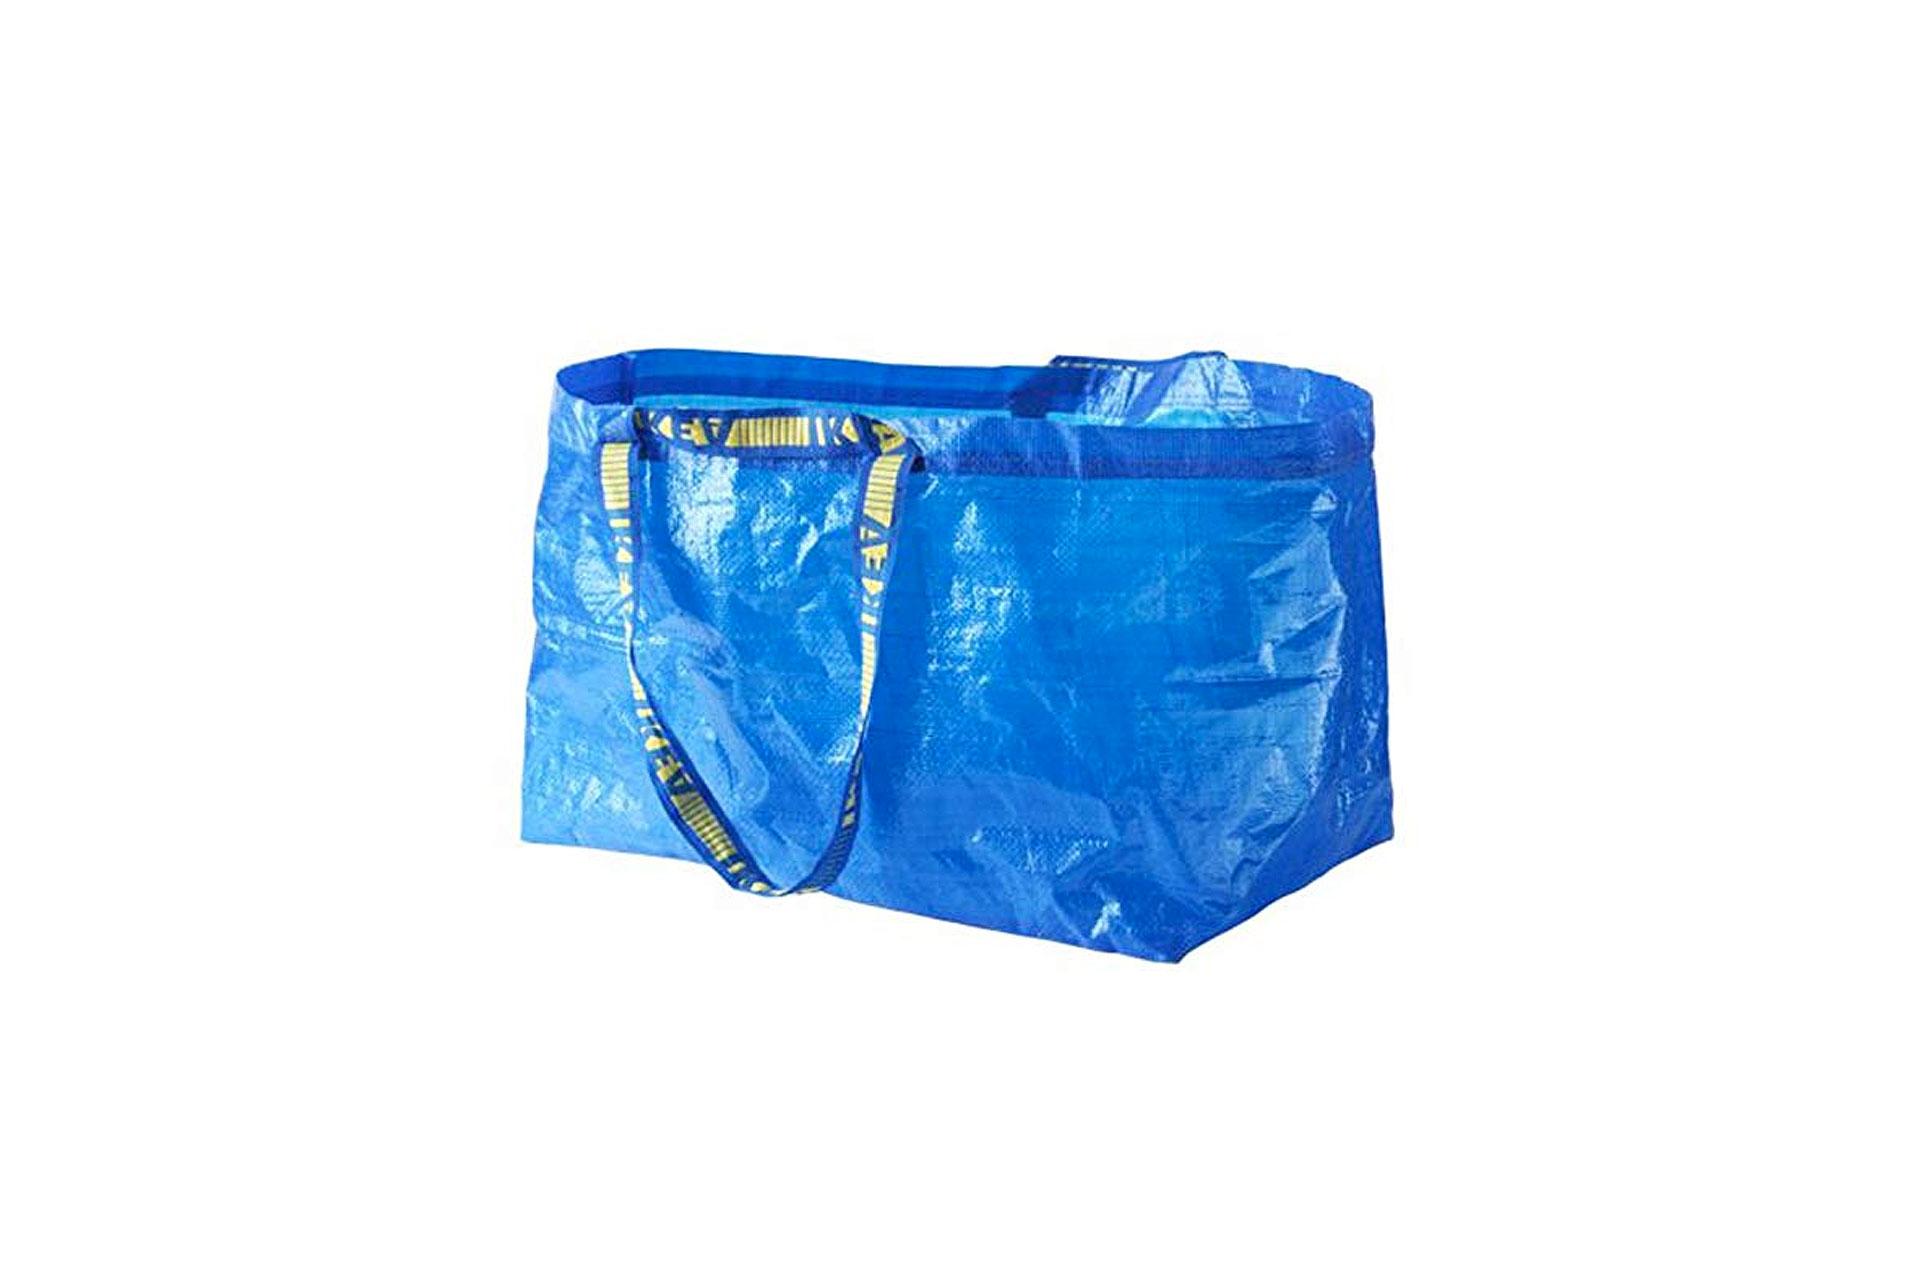 IKEA Bag; Courtesy of Amazon